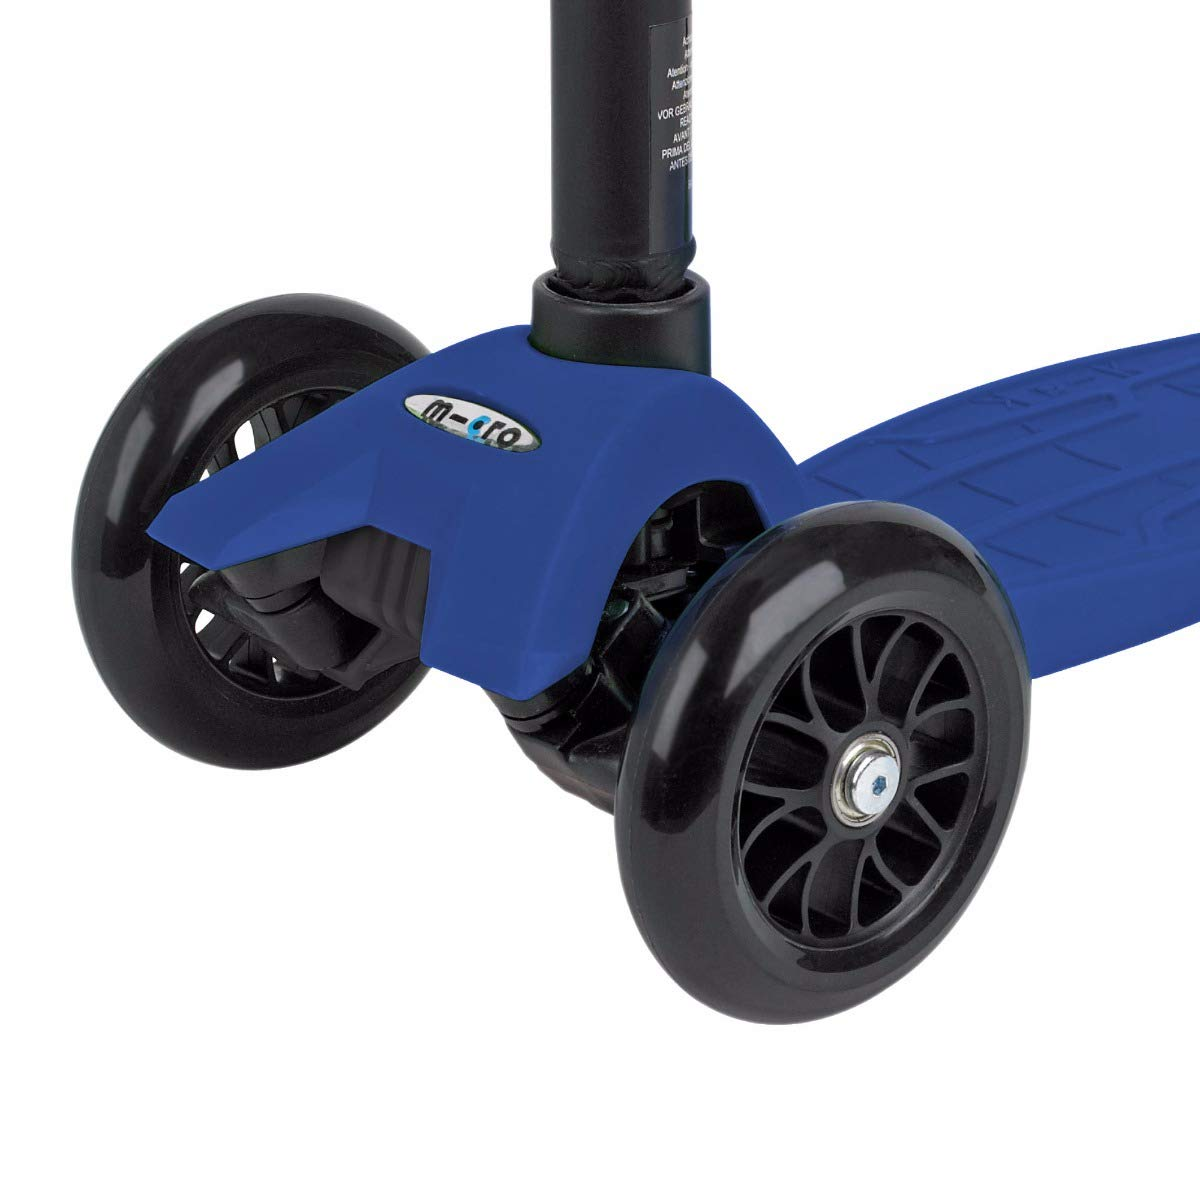 Micro maxi Tbar scooter black